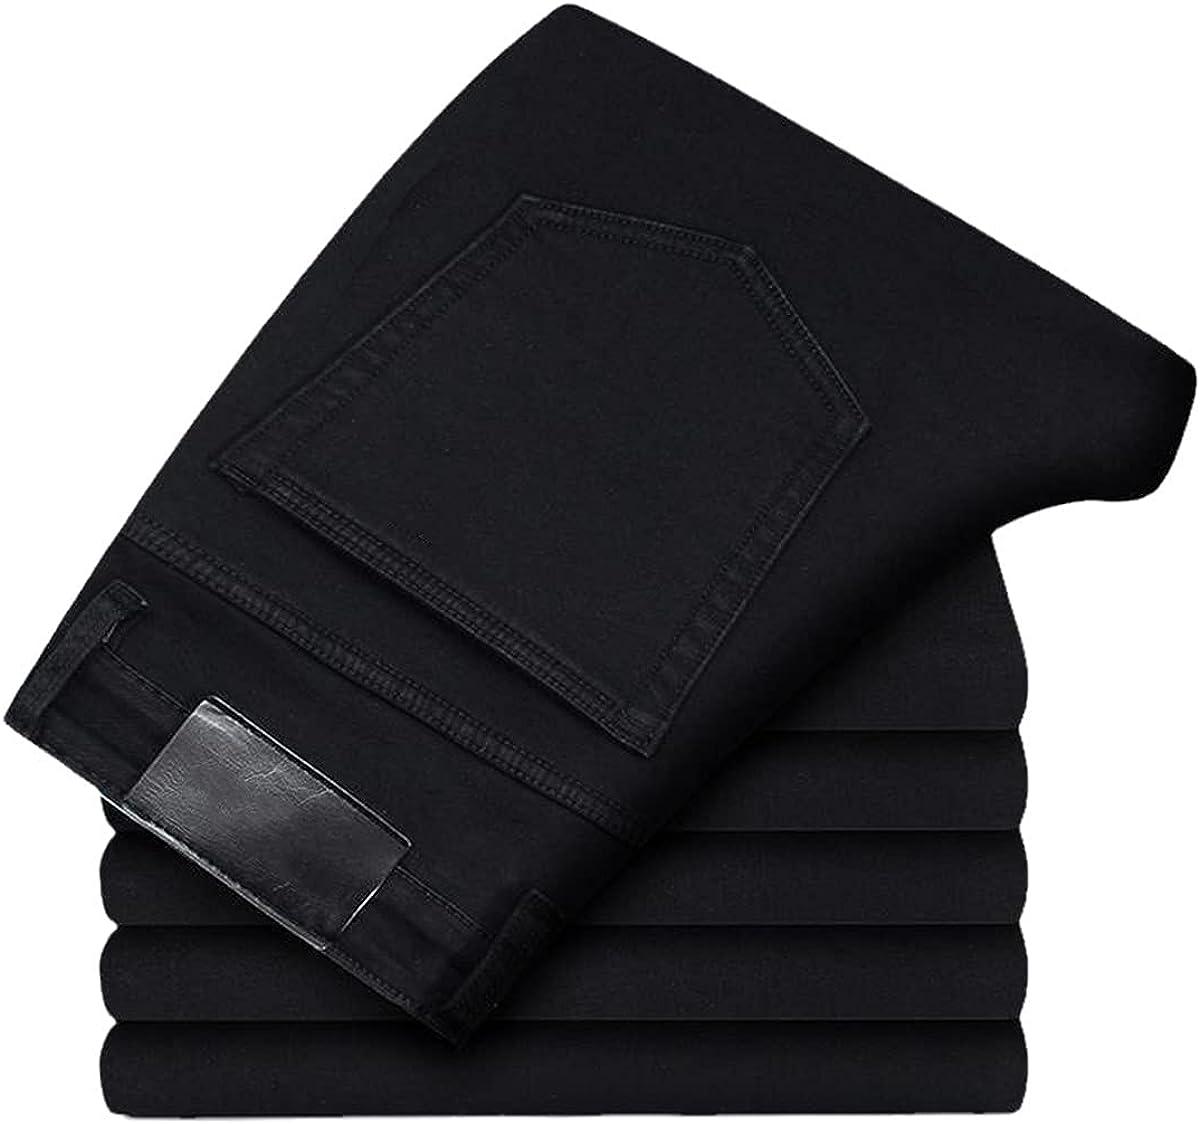 CACLSL Men's Jeans Autumn Denim Trousers Slim Straight Dark Blue Regular-fit Casual Trousers